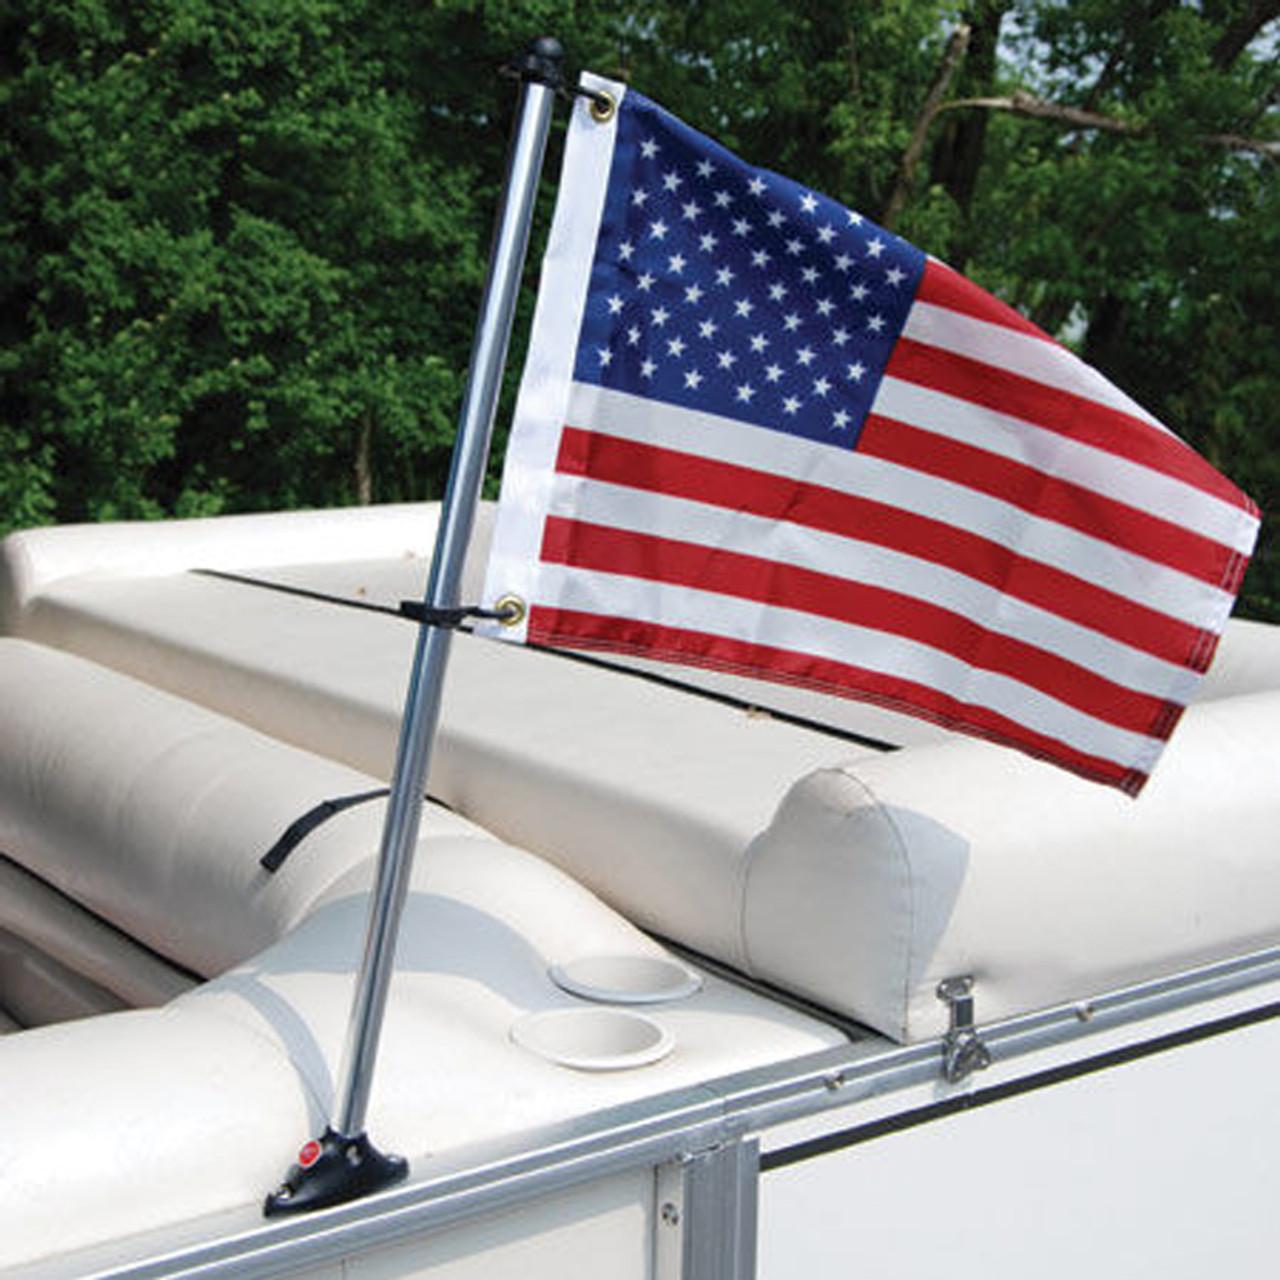 United States Nylon Boat Flags